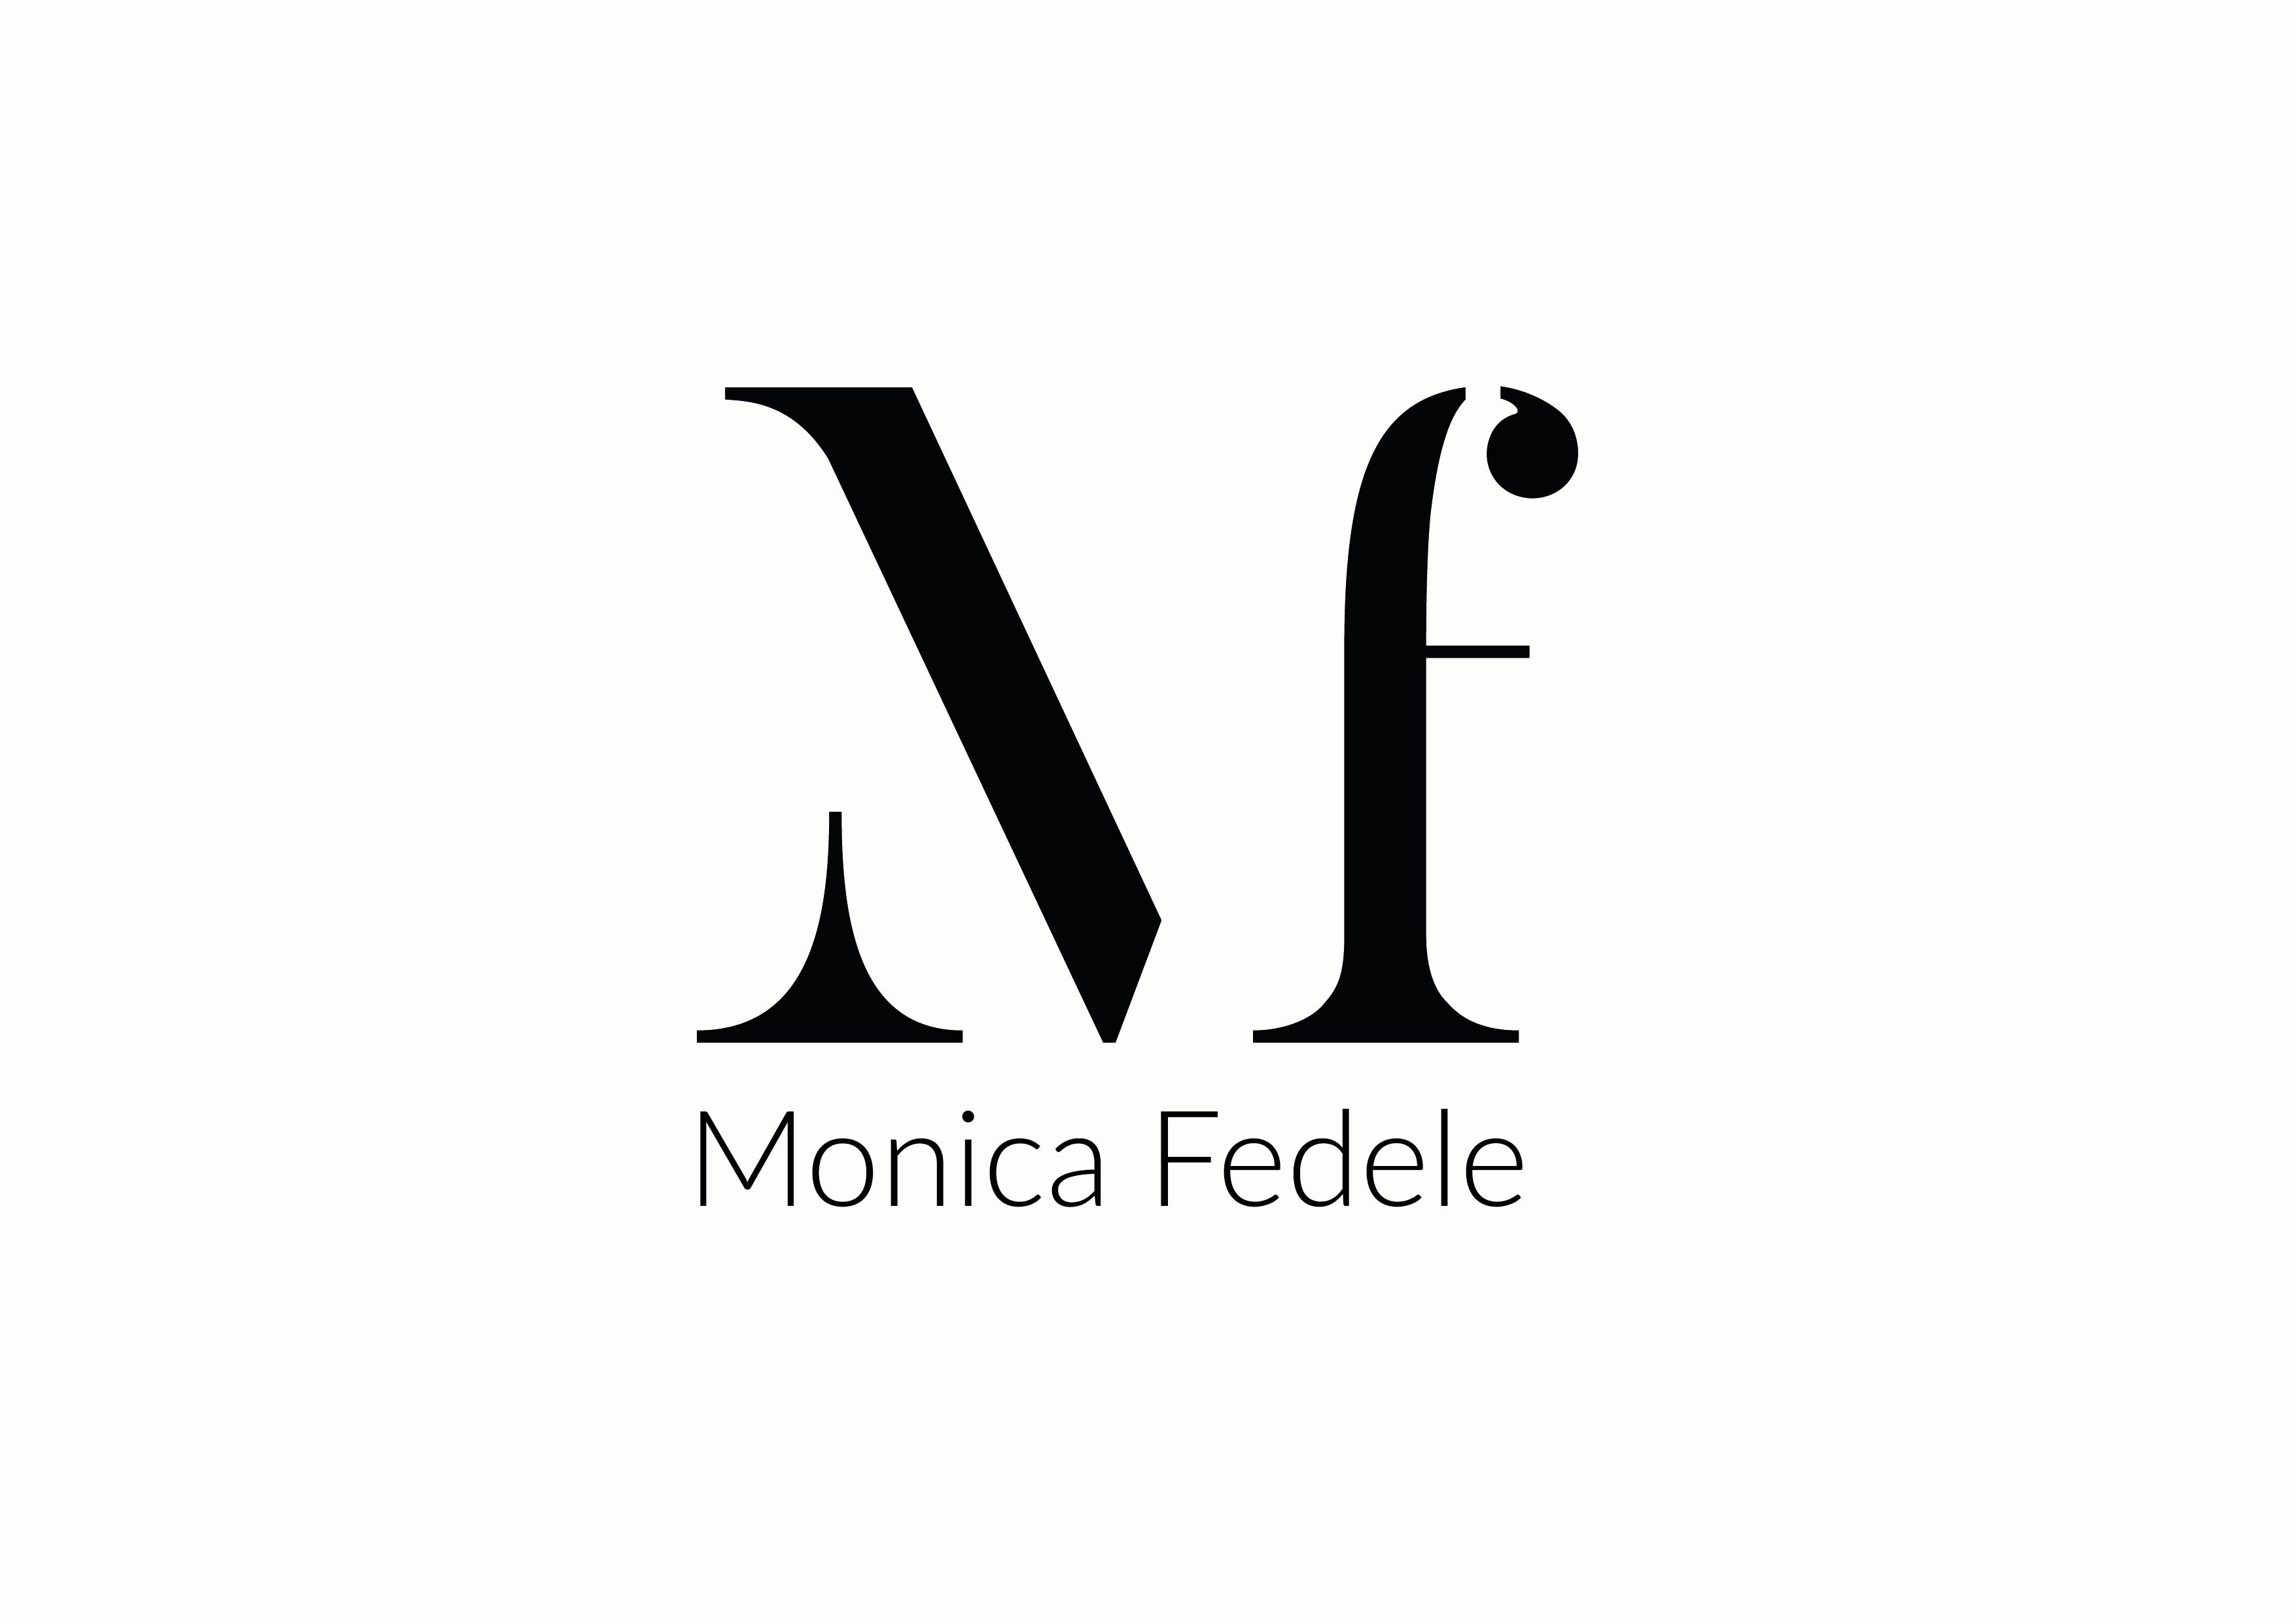 Mf logo design, mf logo monica fedele.